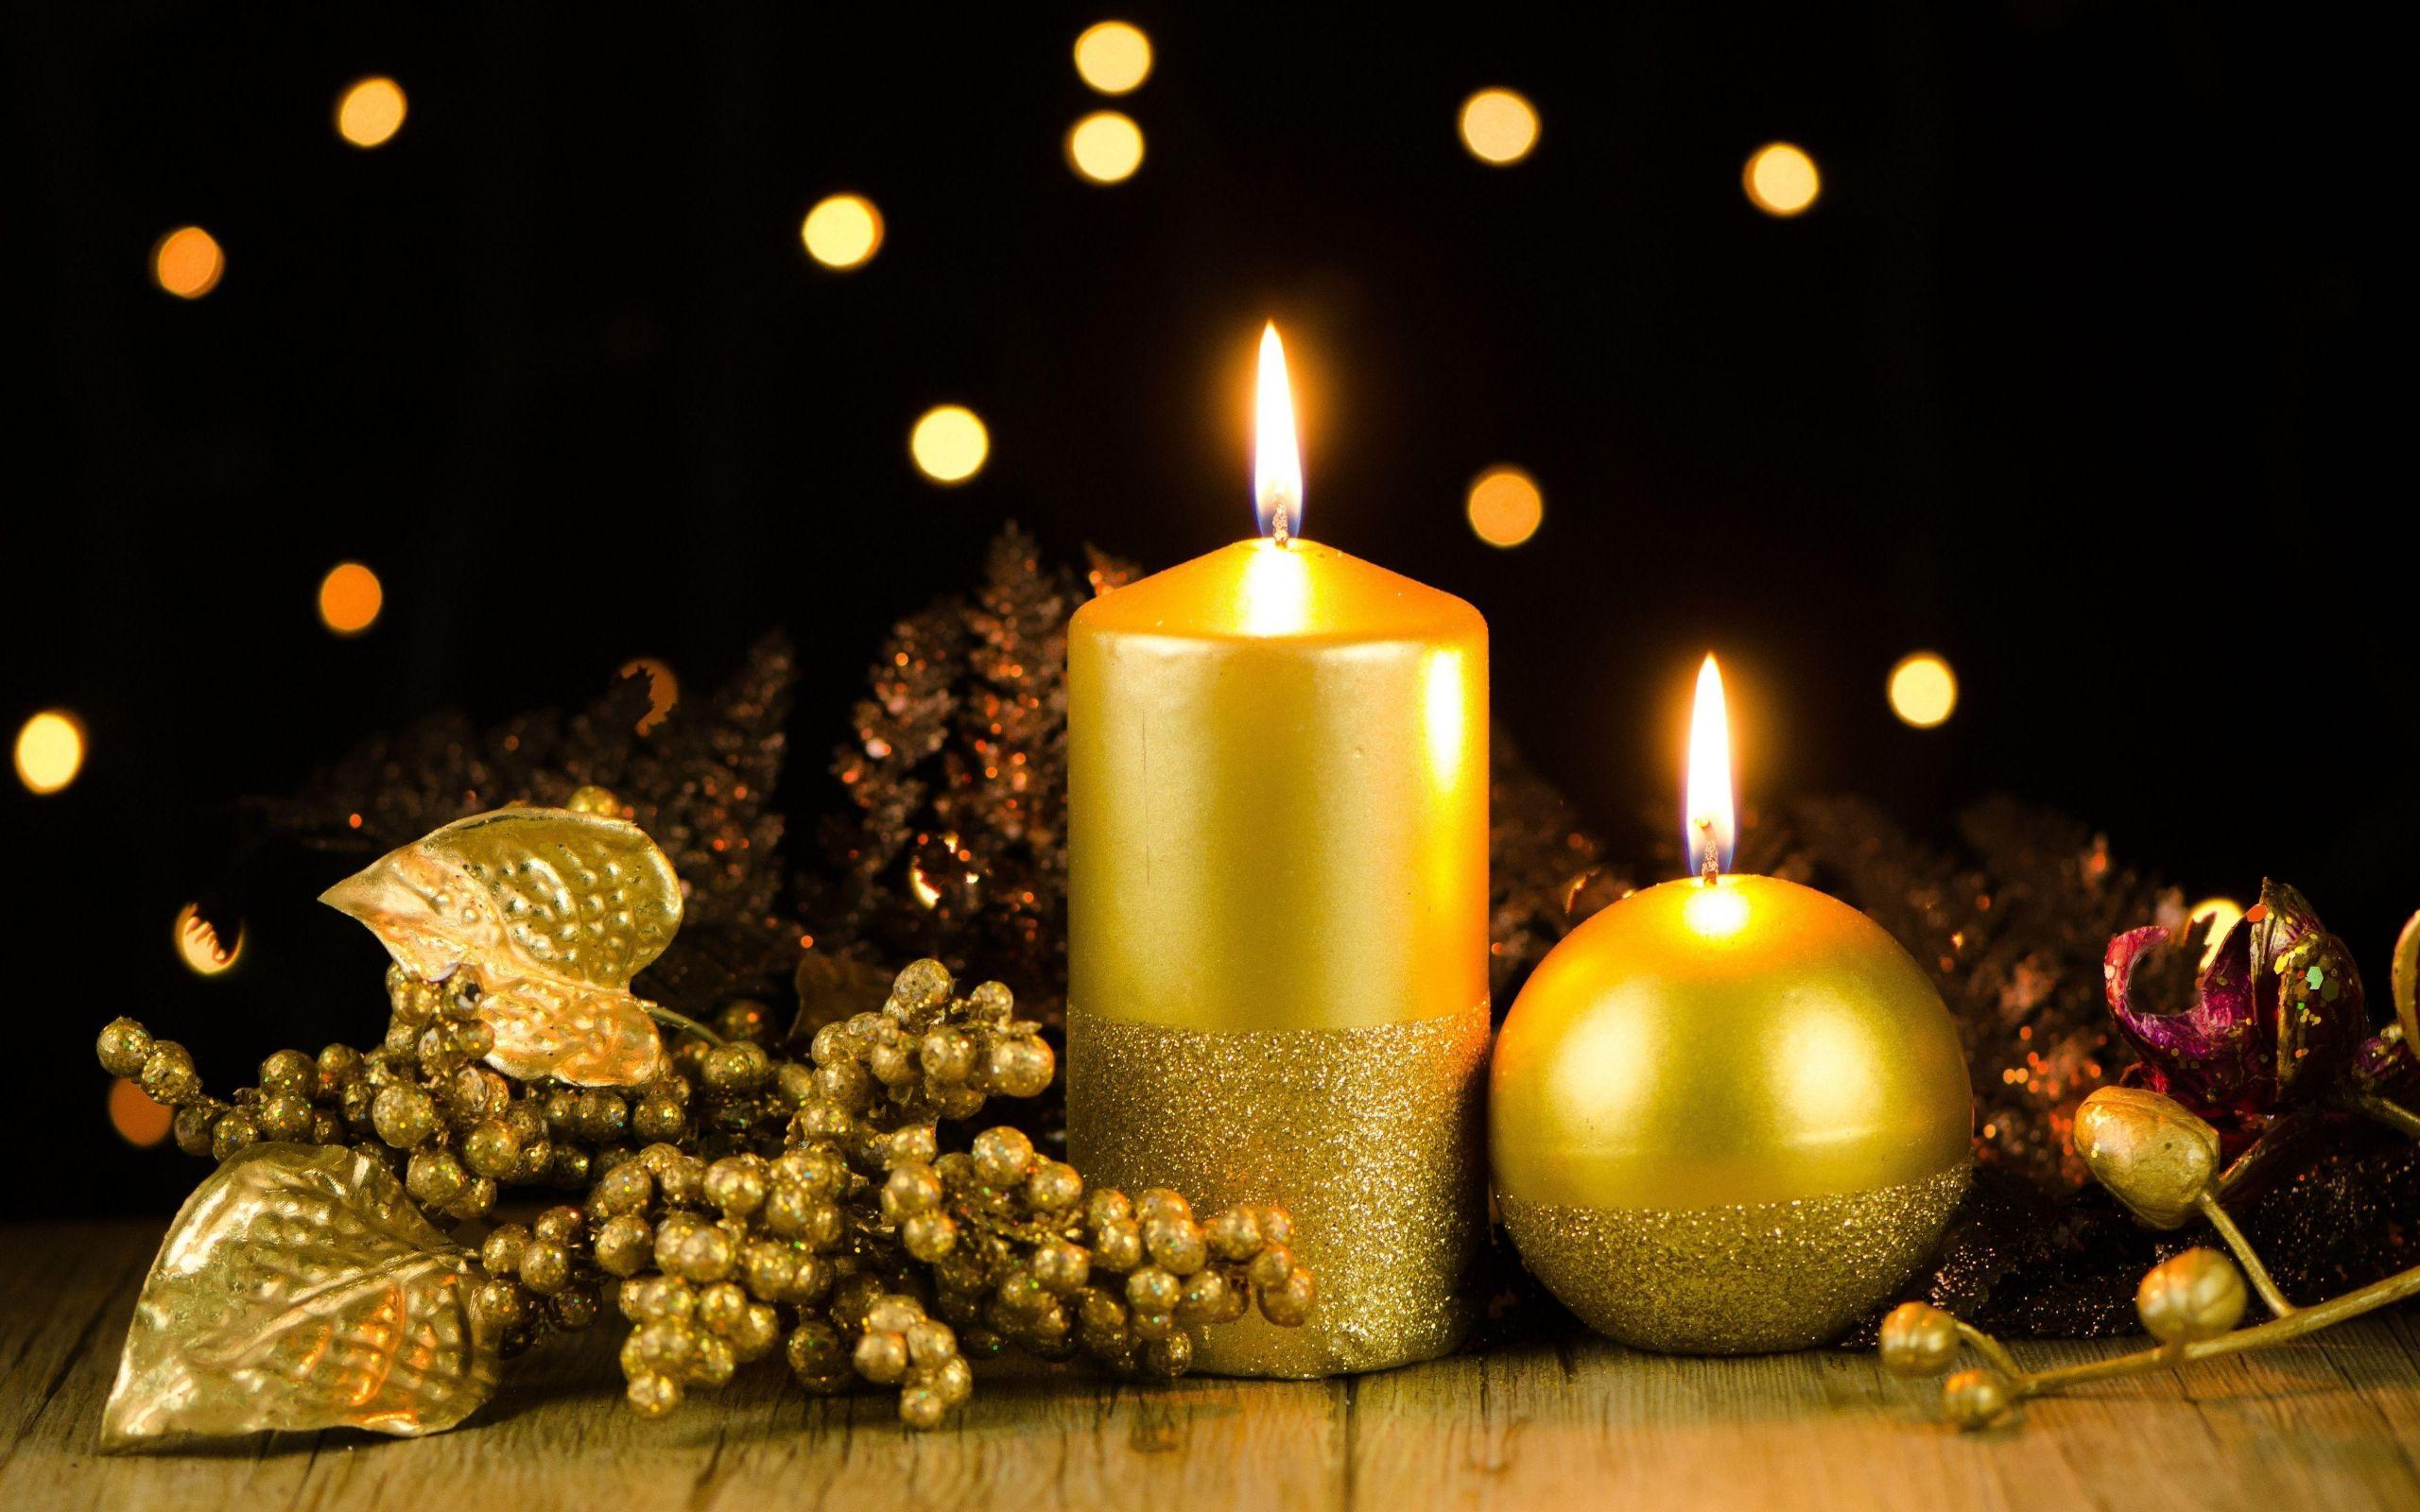 2560x1600 Wallpaper Candles Decoration Gold Glitter